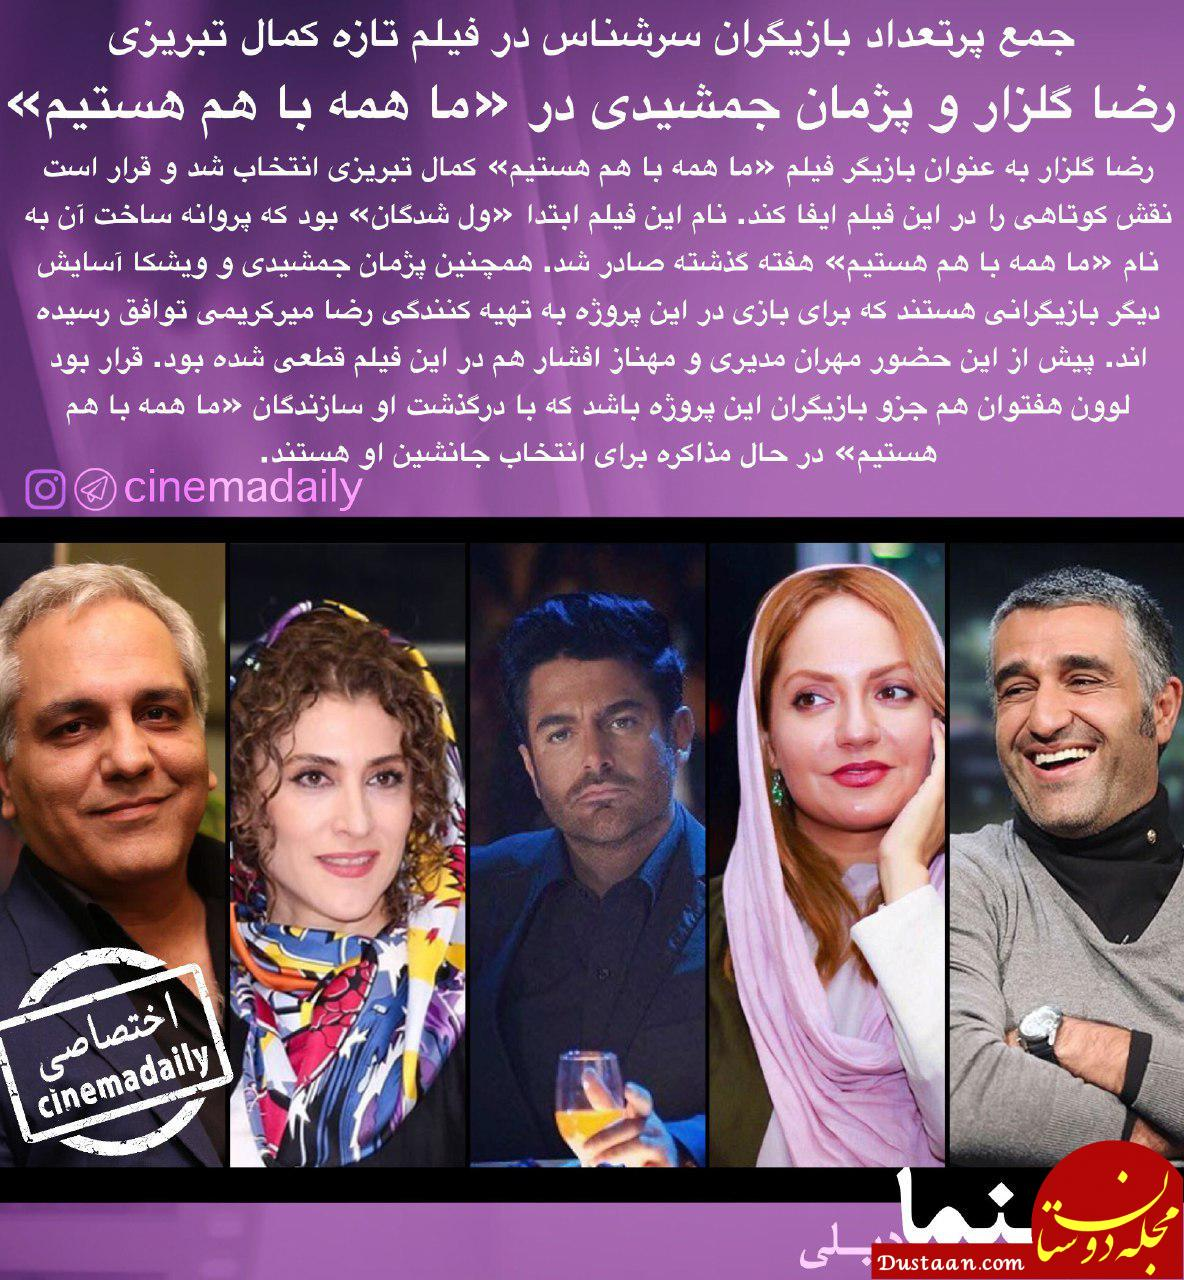 www.dustaan.com گریم دیدنی مهران مدیری در جدیدترین فیلم کمال تبریزی +عکس